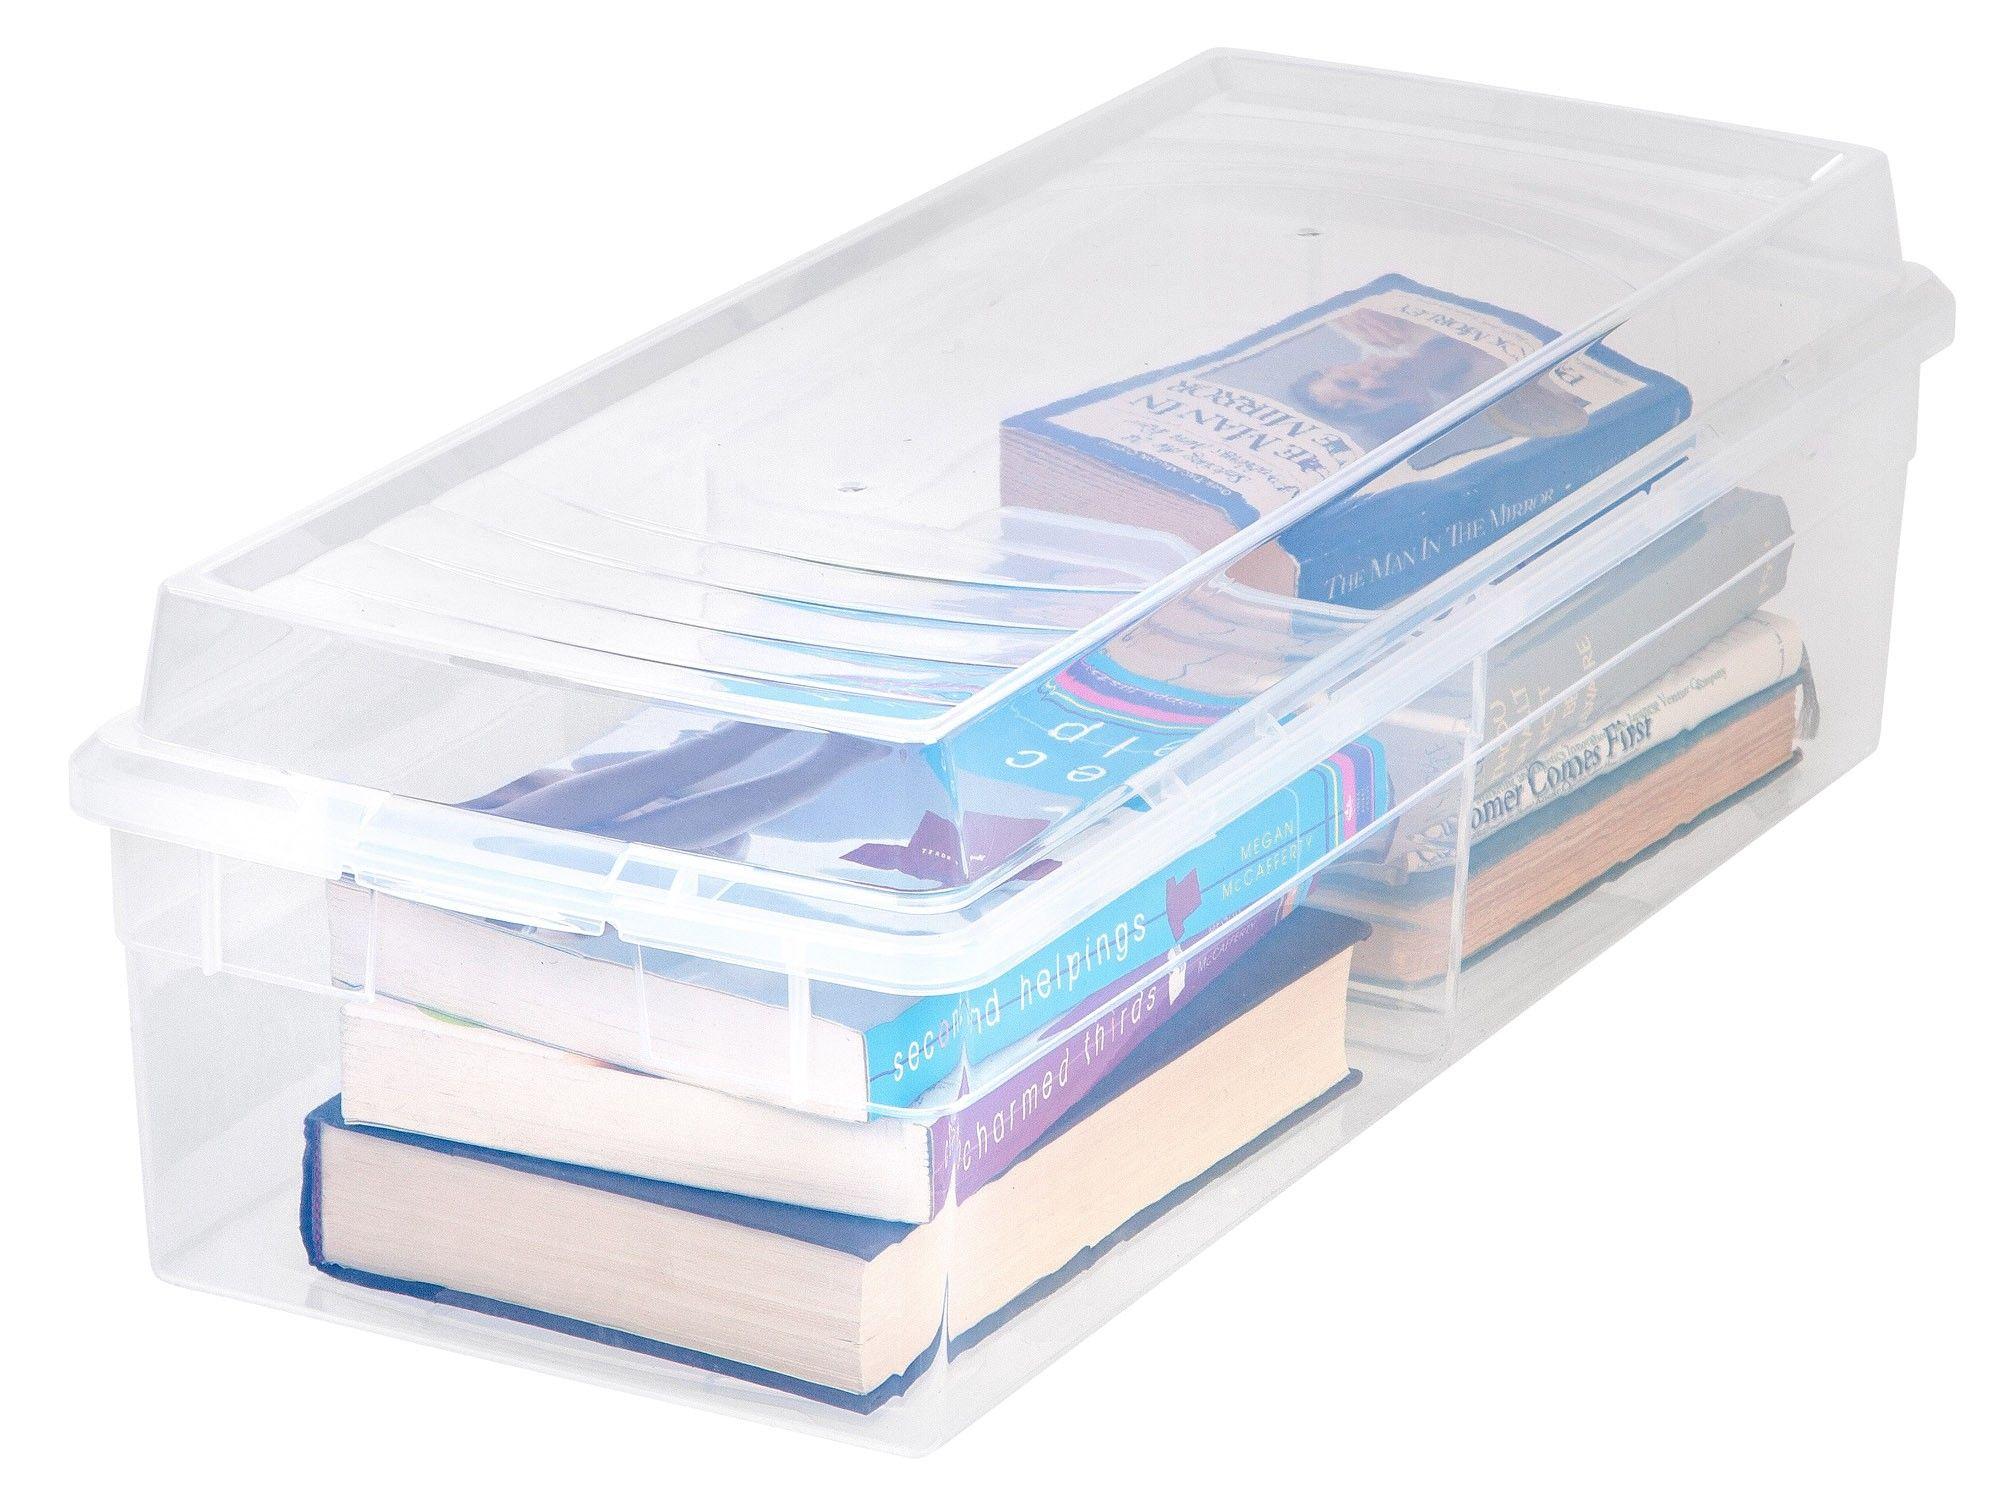 Large Divided Storage Box | Pinterest | Media storage, Storage boxes ...